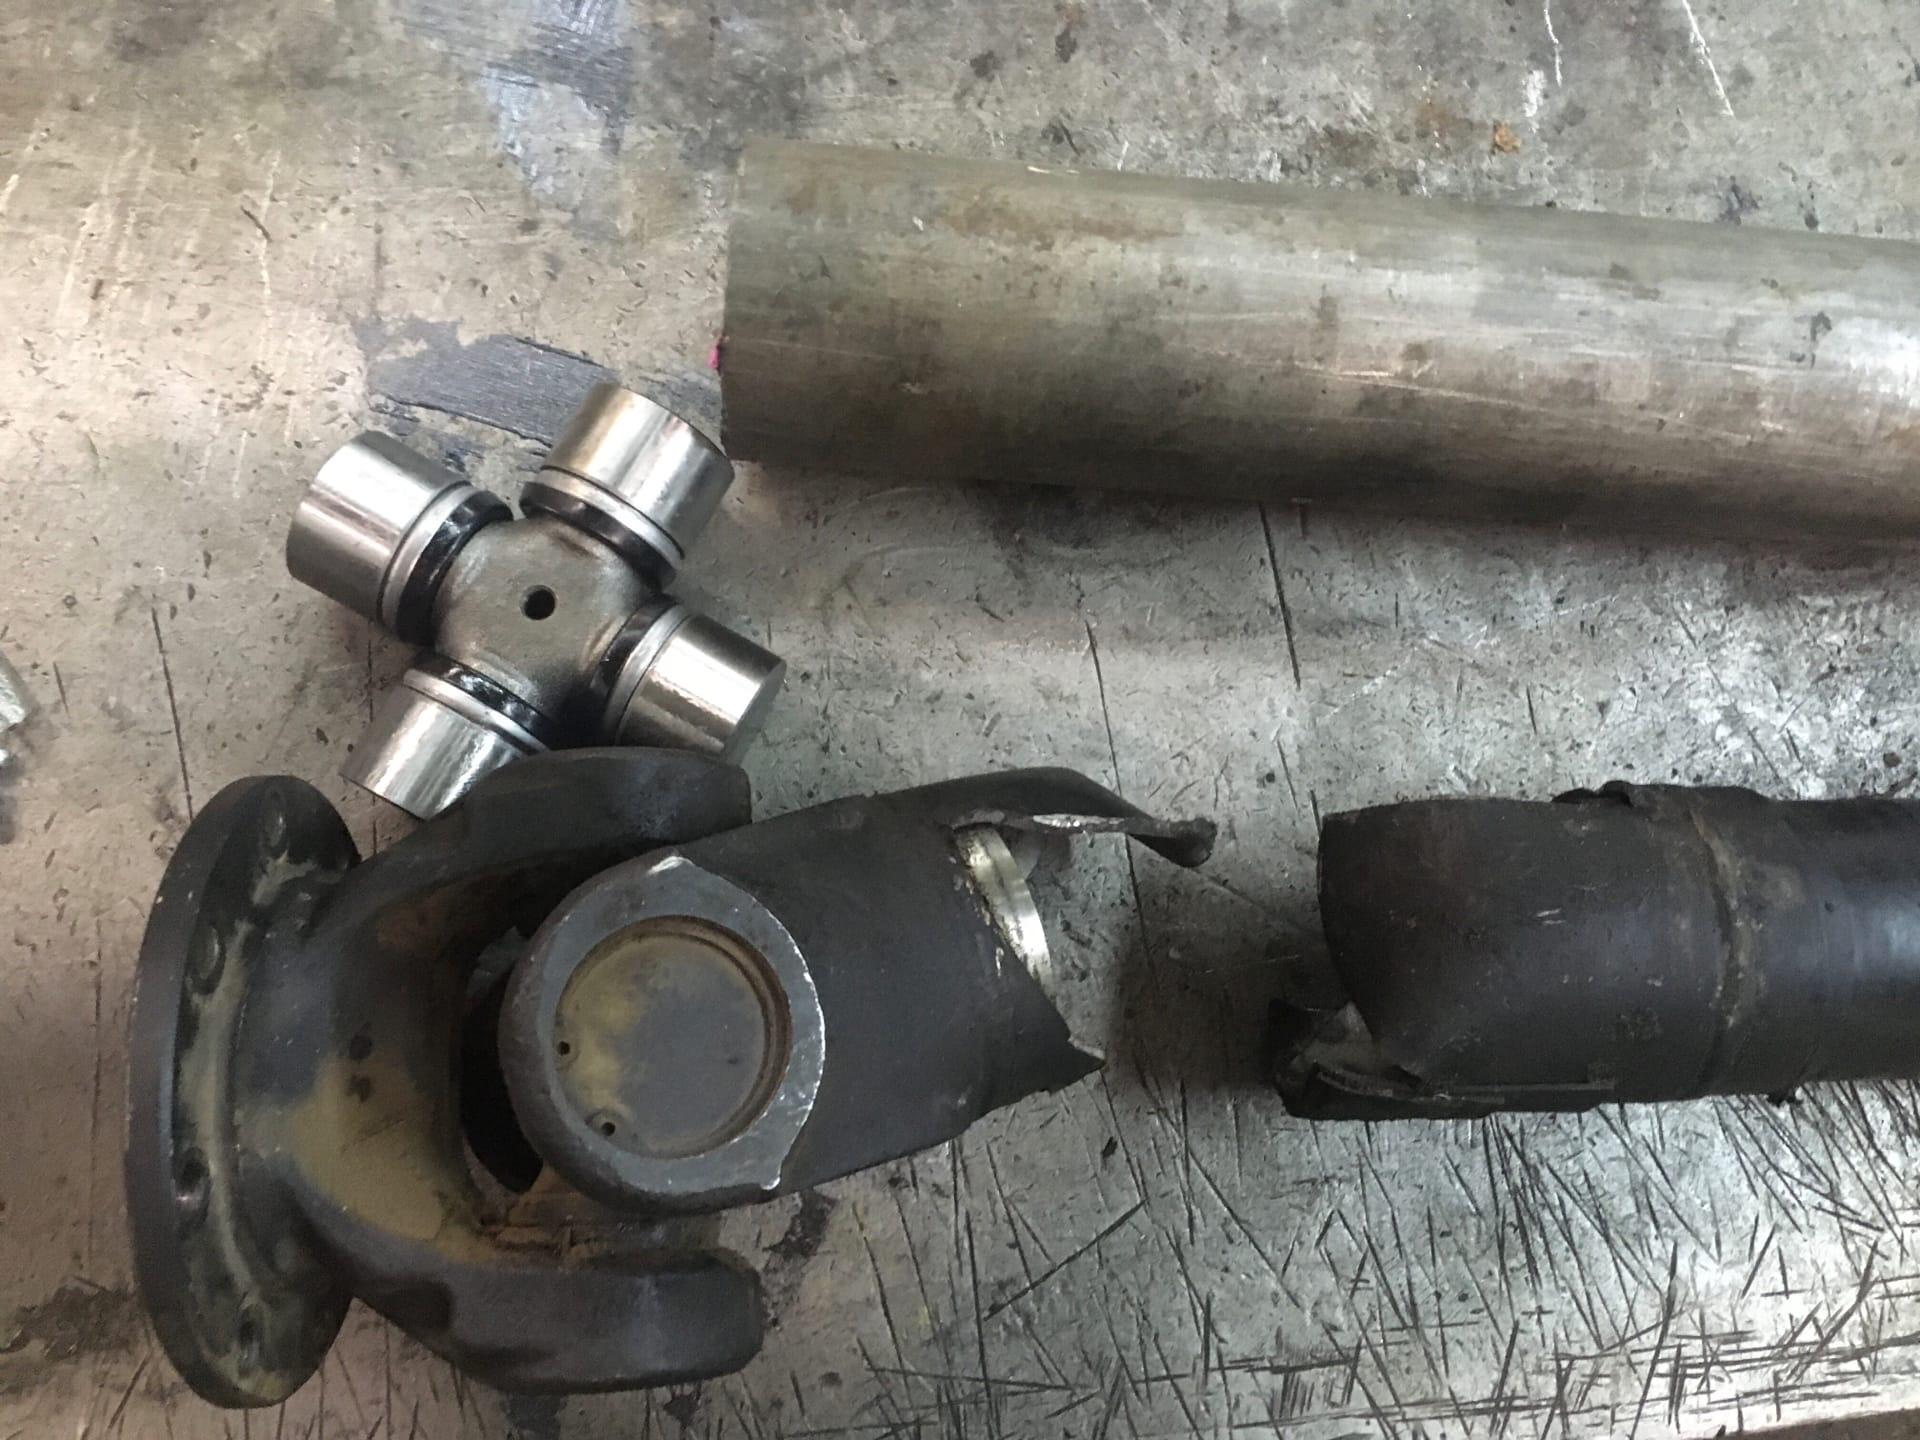 Ремонт 2-х опорного карданного вала трактора Кировец К-424